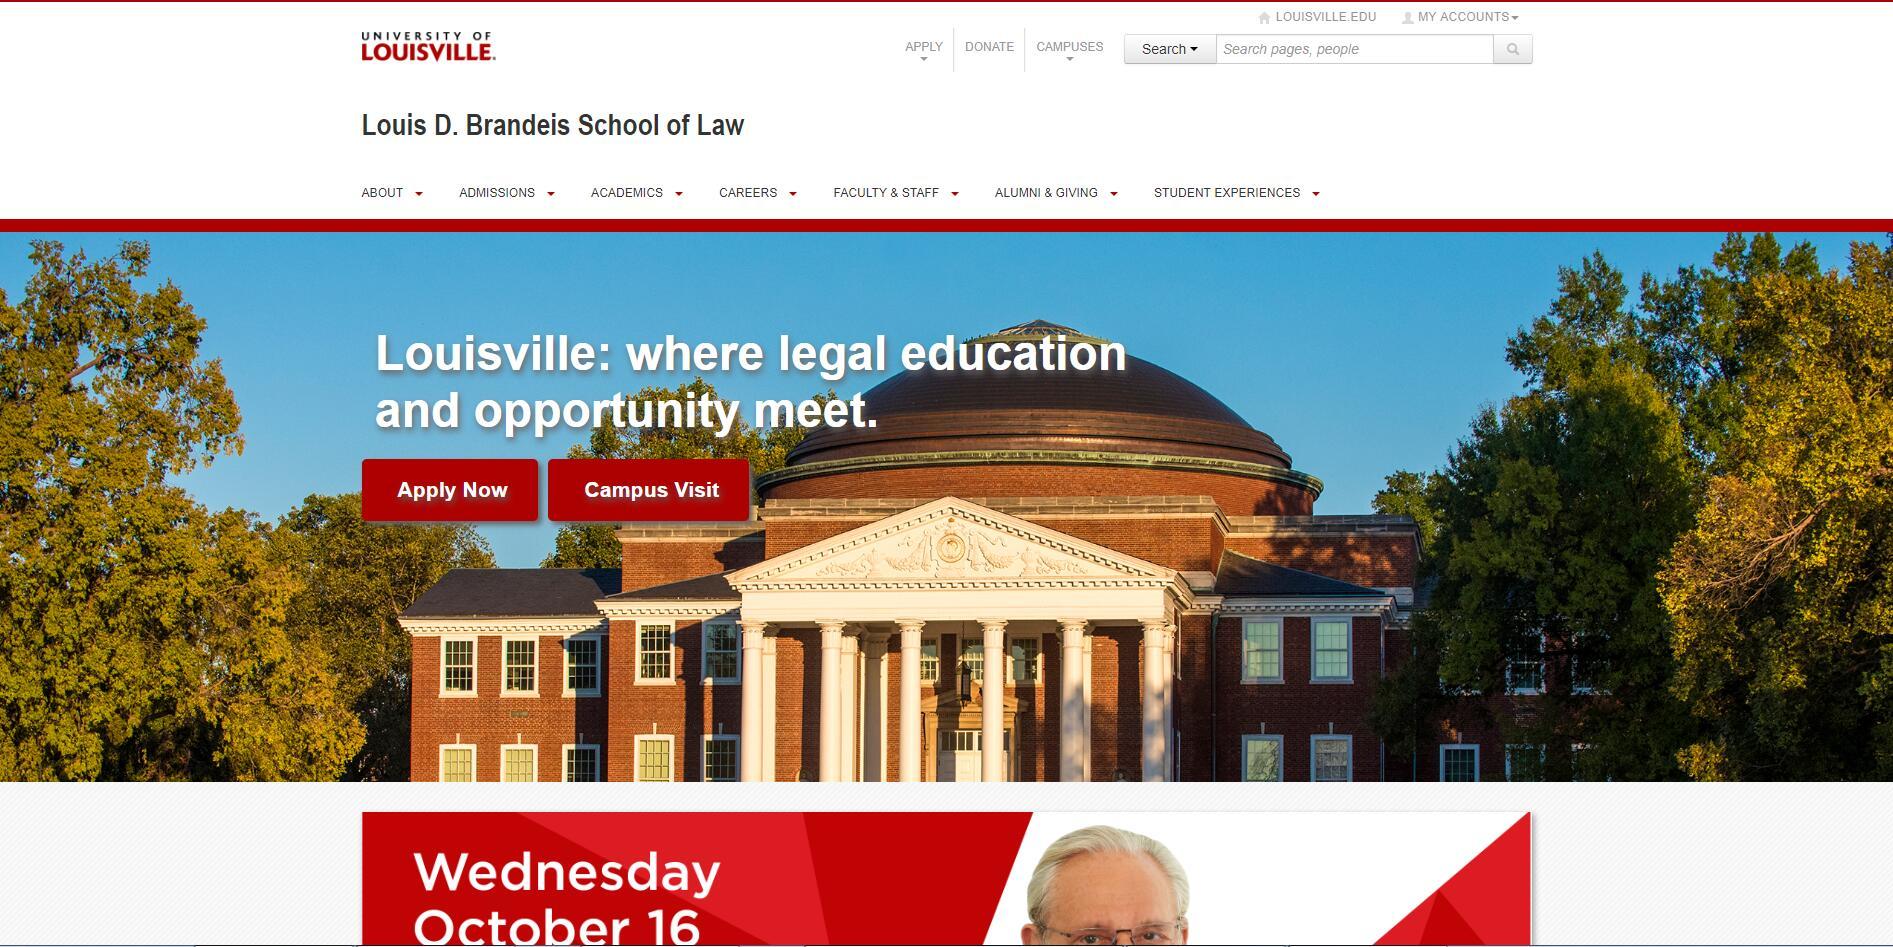 The Louis D. Brandeis School of Law at University of Louisville